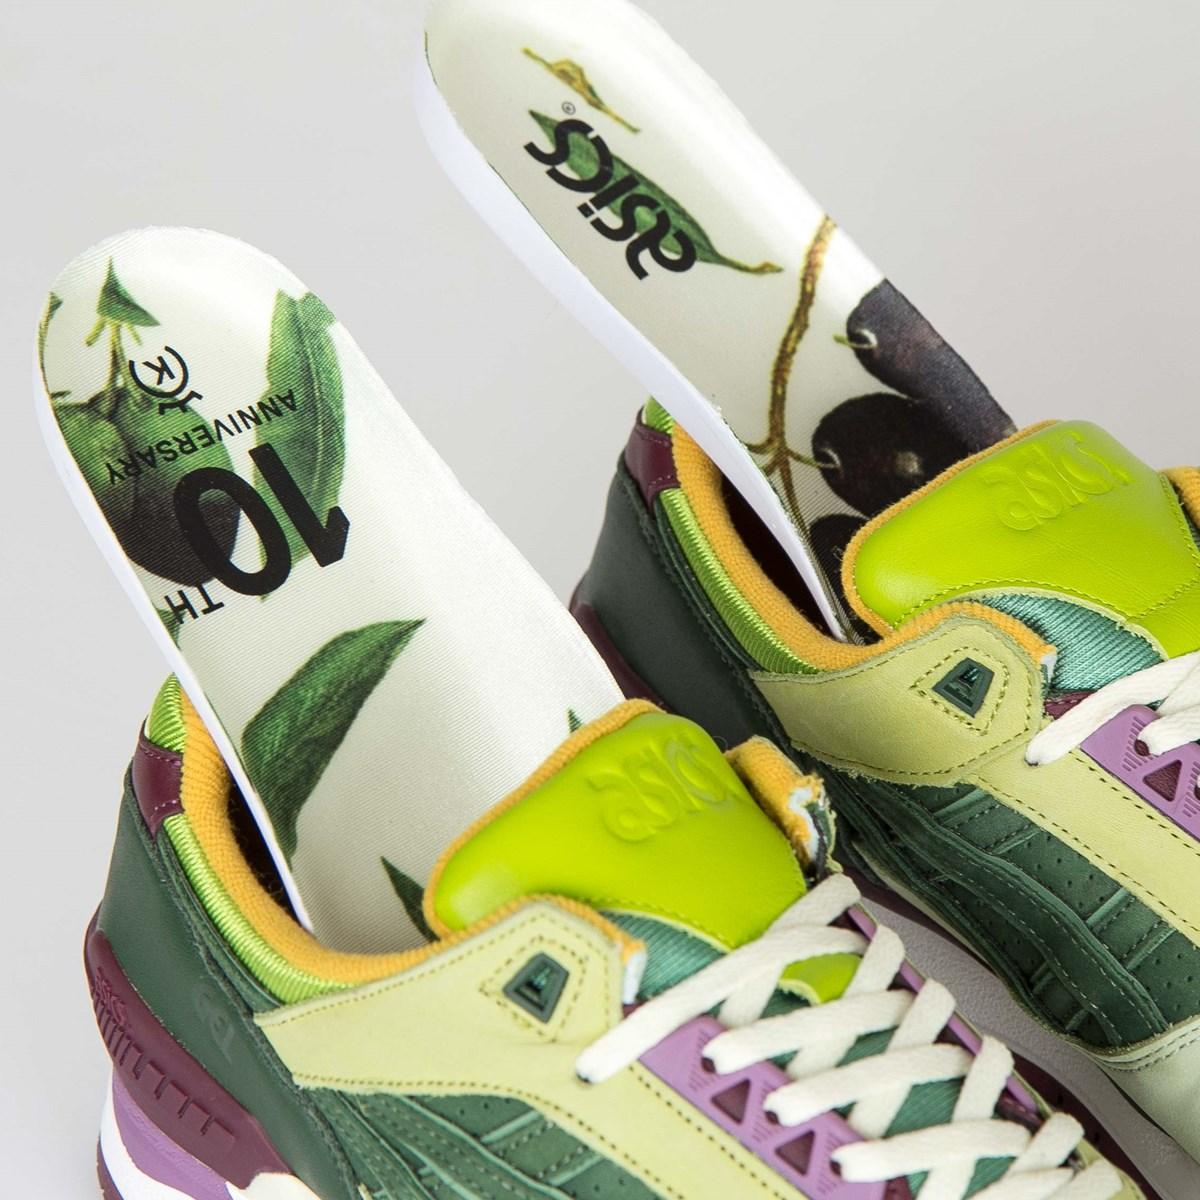 Respector Gel SneakersnstuffSneakers Tiger H53uk 8686 Asics 5jLR4A